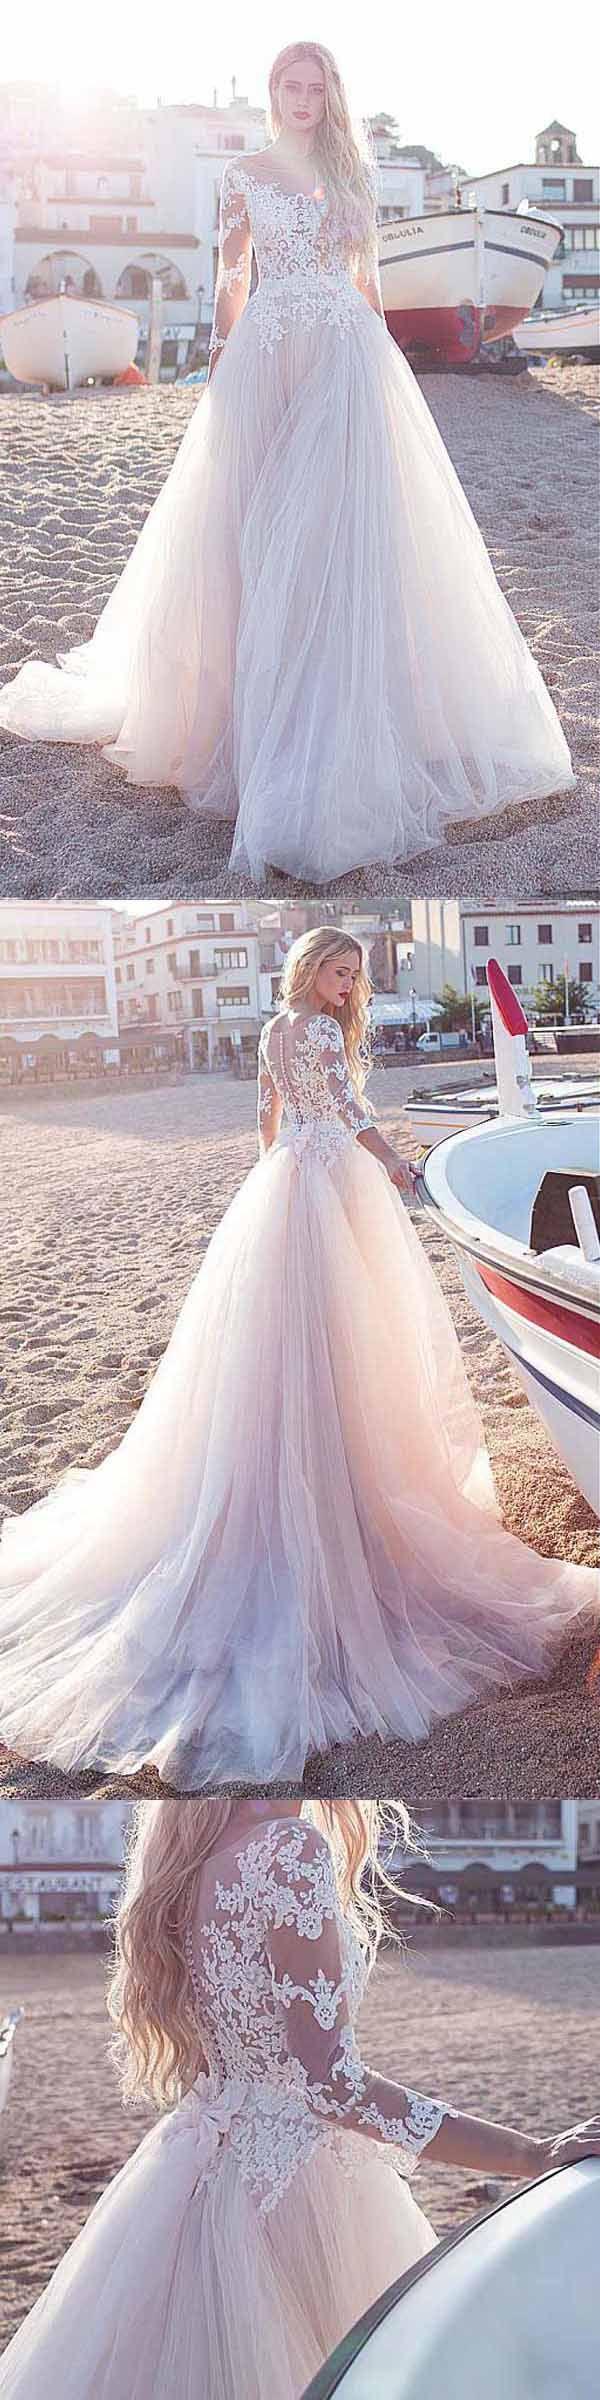 Tulle Scoop Neckline A-line Wedding Dress With Lace Appliques WD188 #wedding #beachwedding #weddingdress #dreamwedding #pgmdress